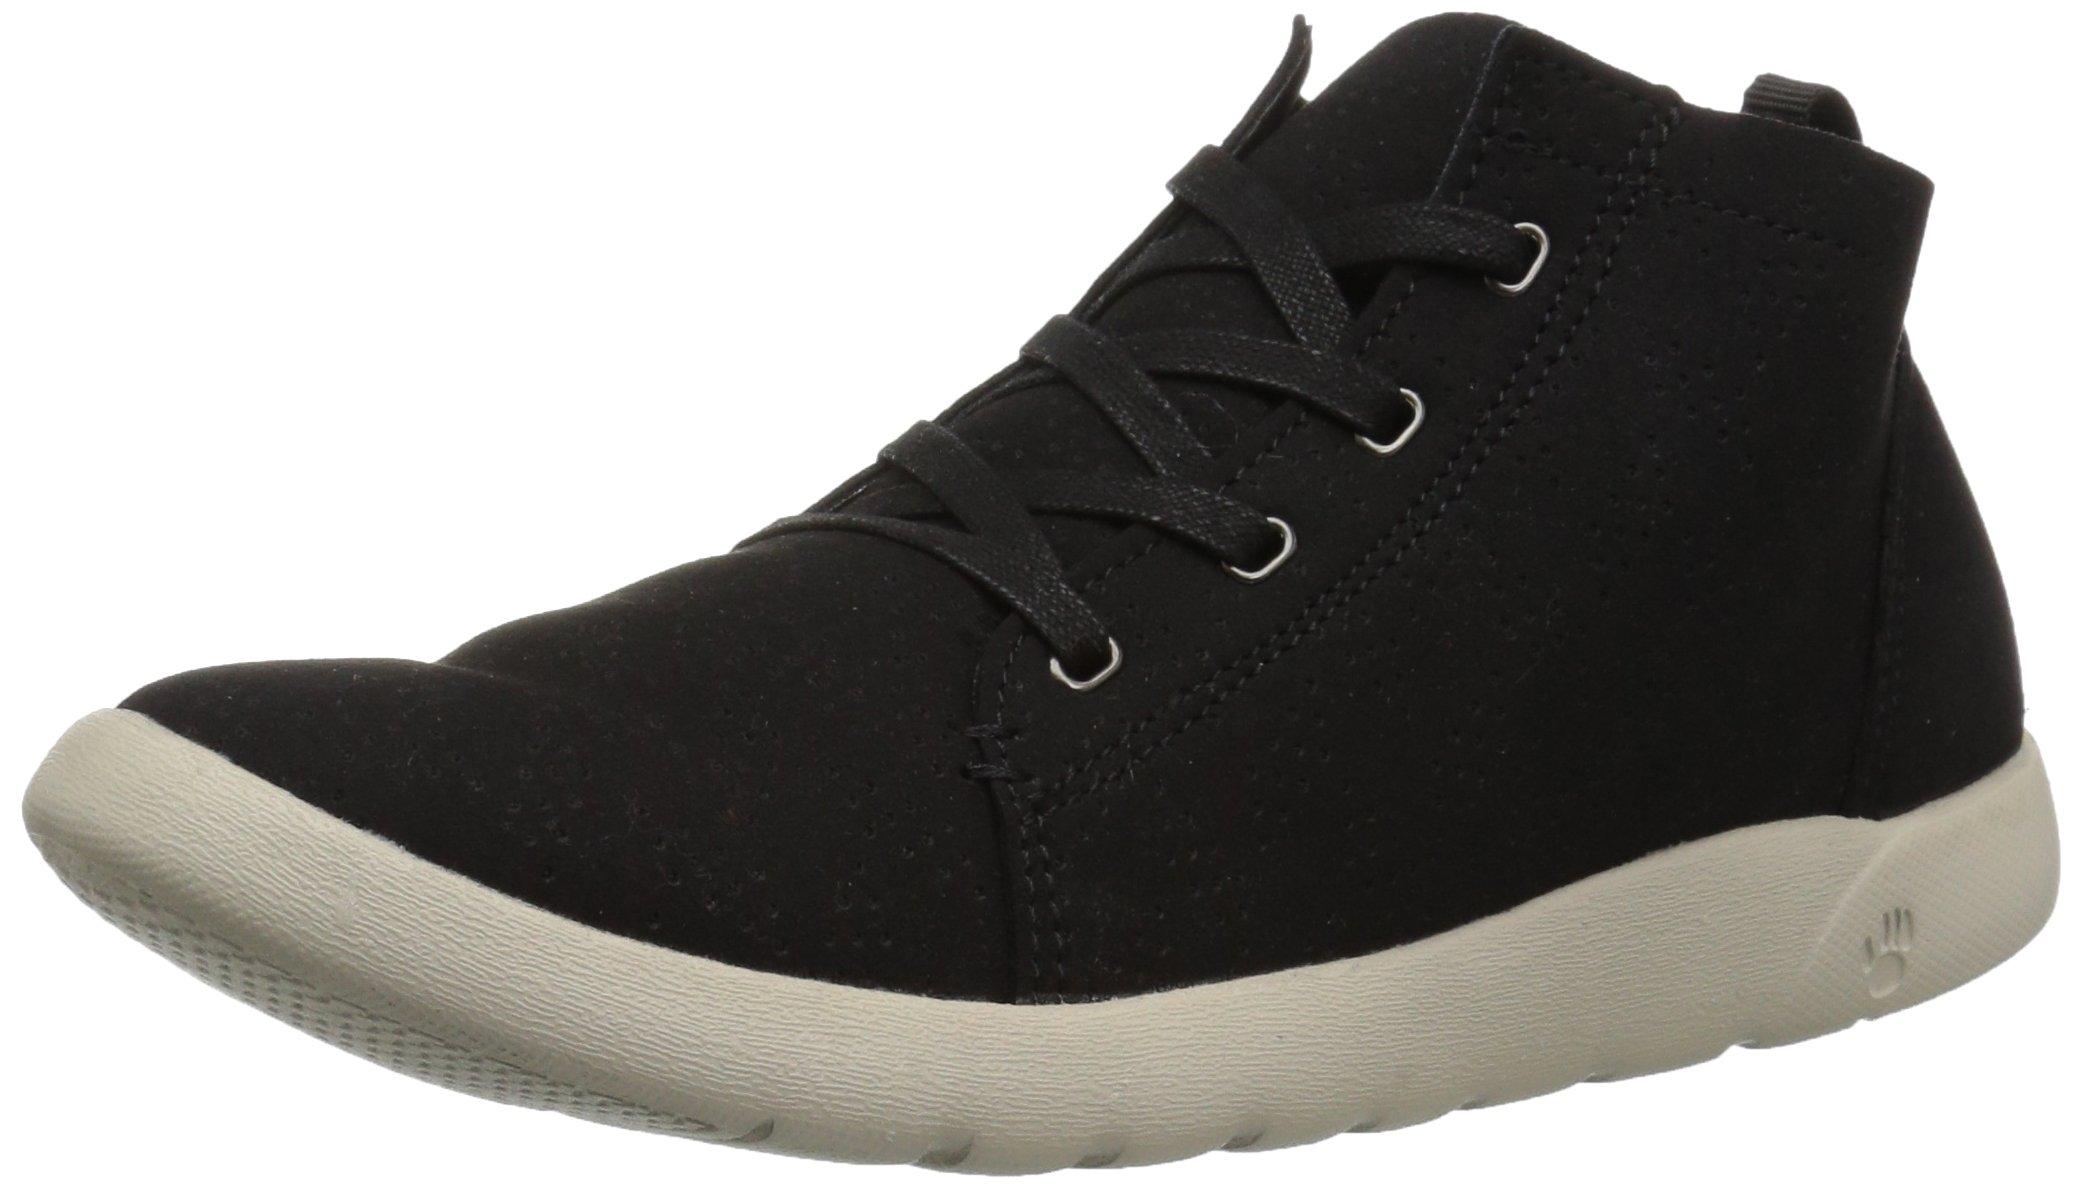 BEARPAW Women's Gracie Oxford Boot, Black, 11 M US